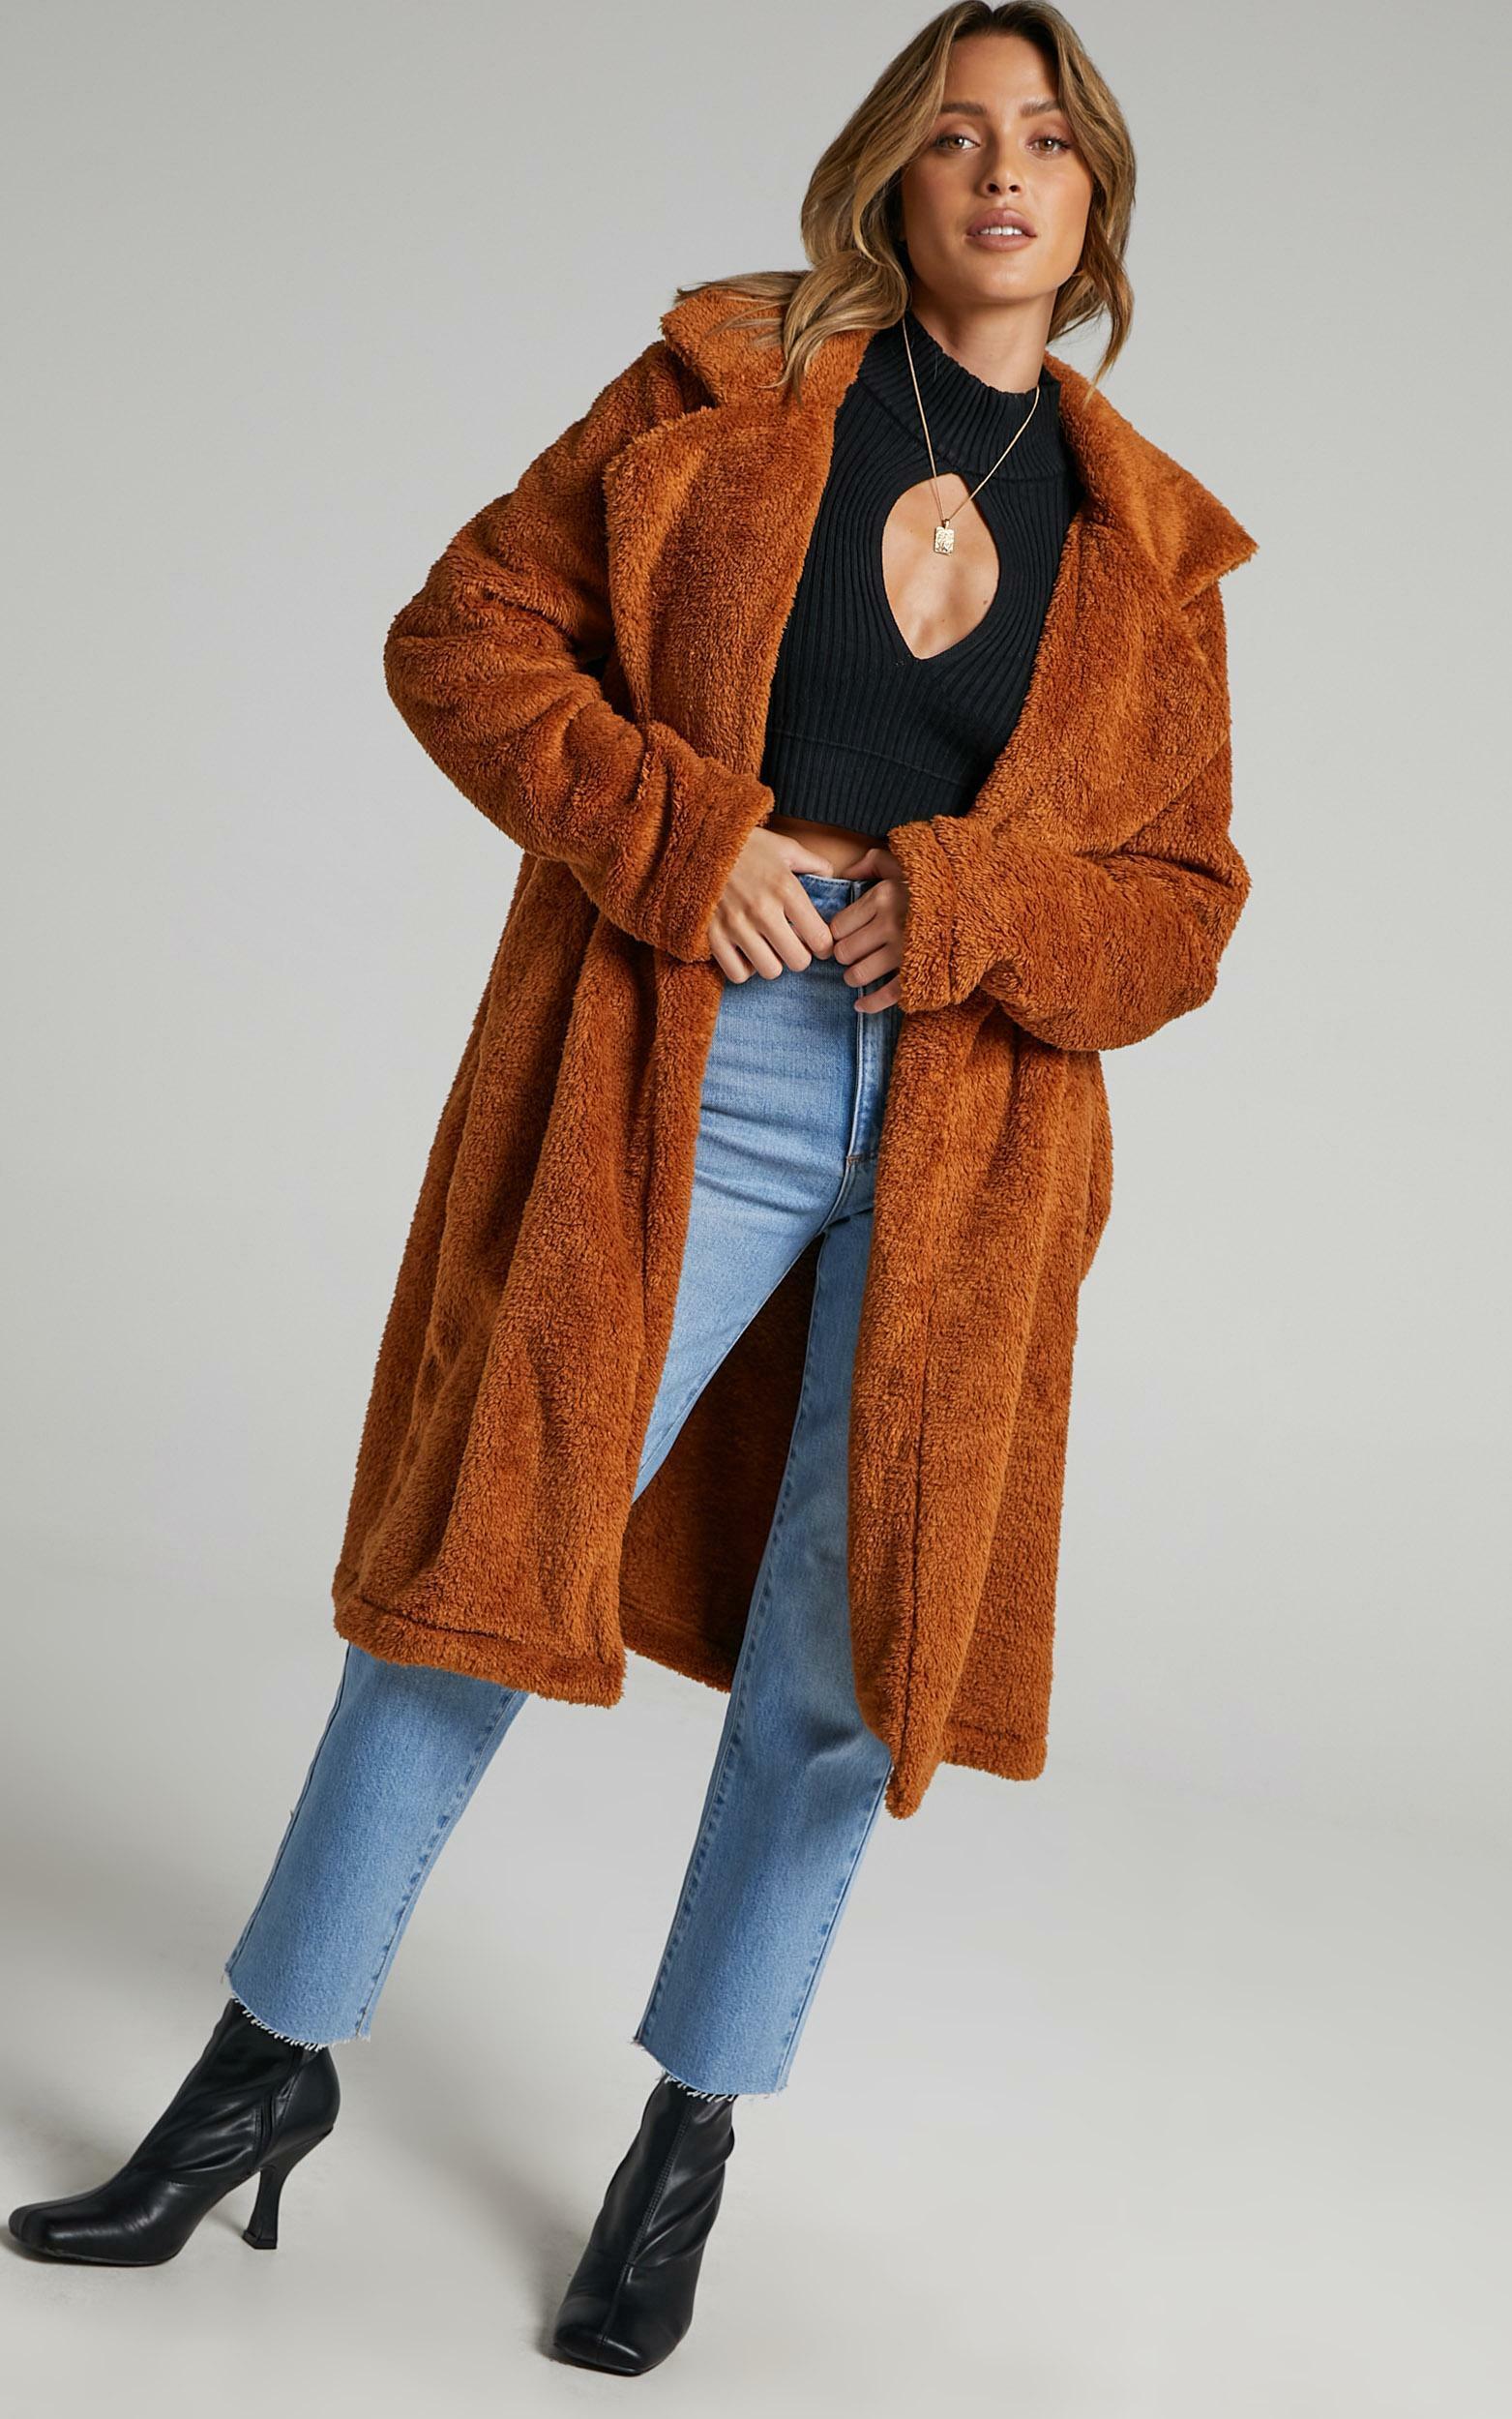 Adairia Coat in Camel - 6 (XS), Camel, hi-res image number null